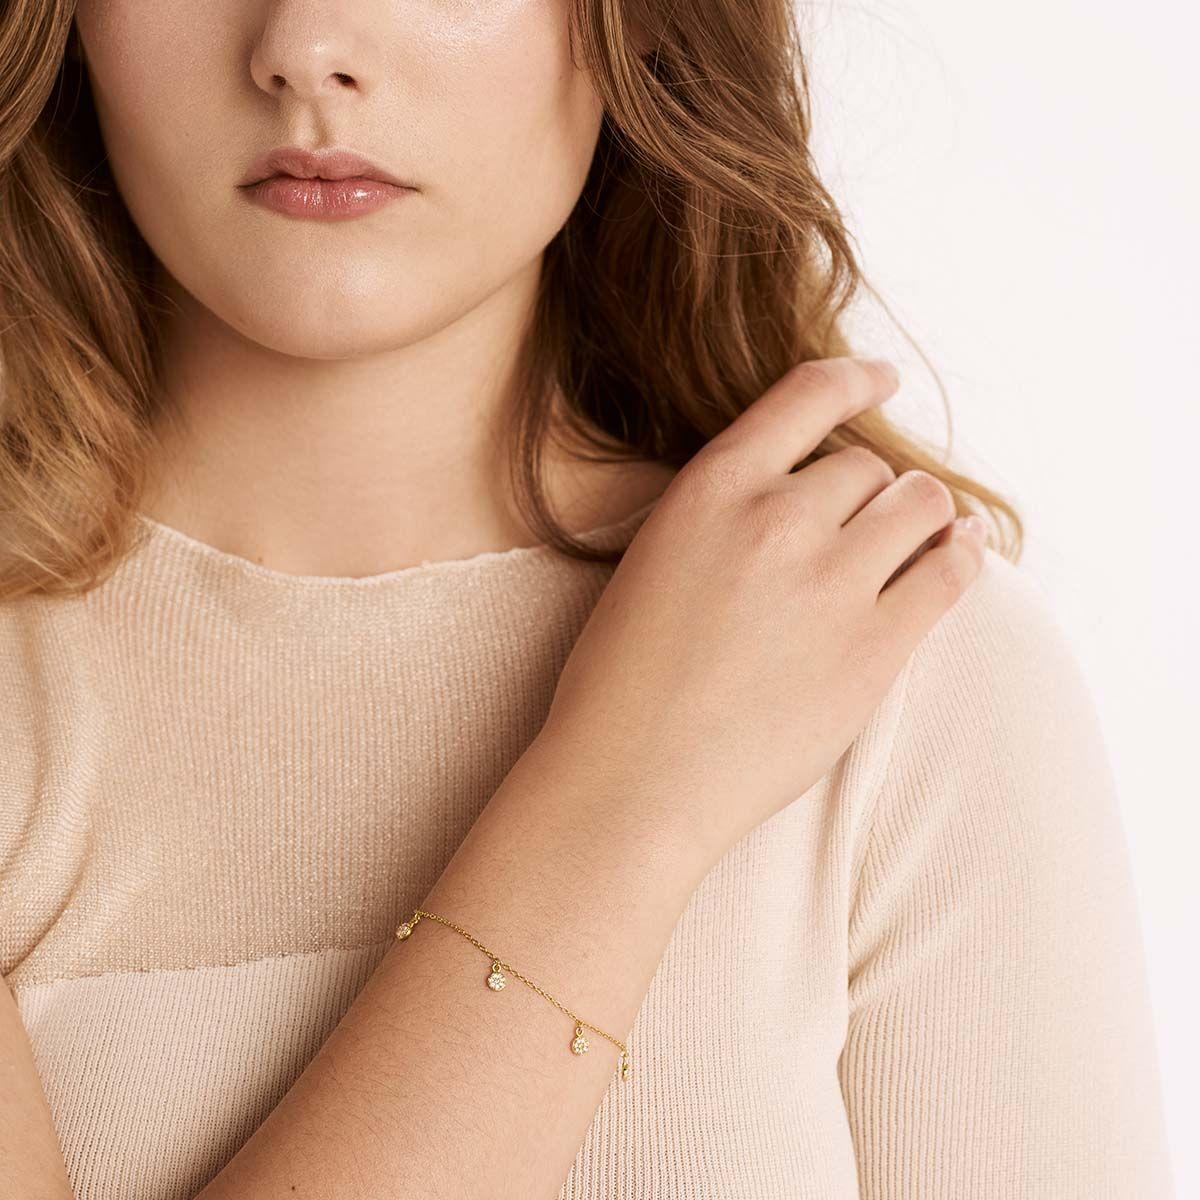 Celeste - Armband - Silber